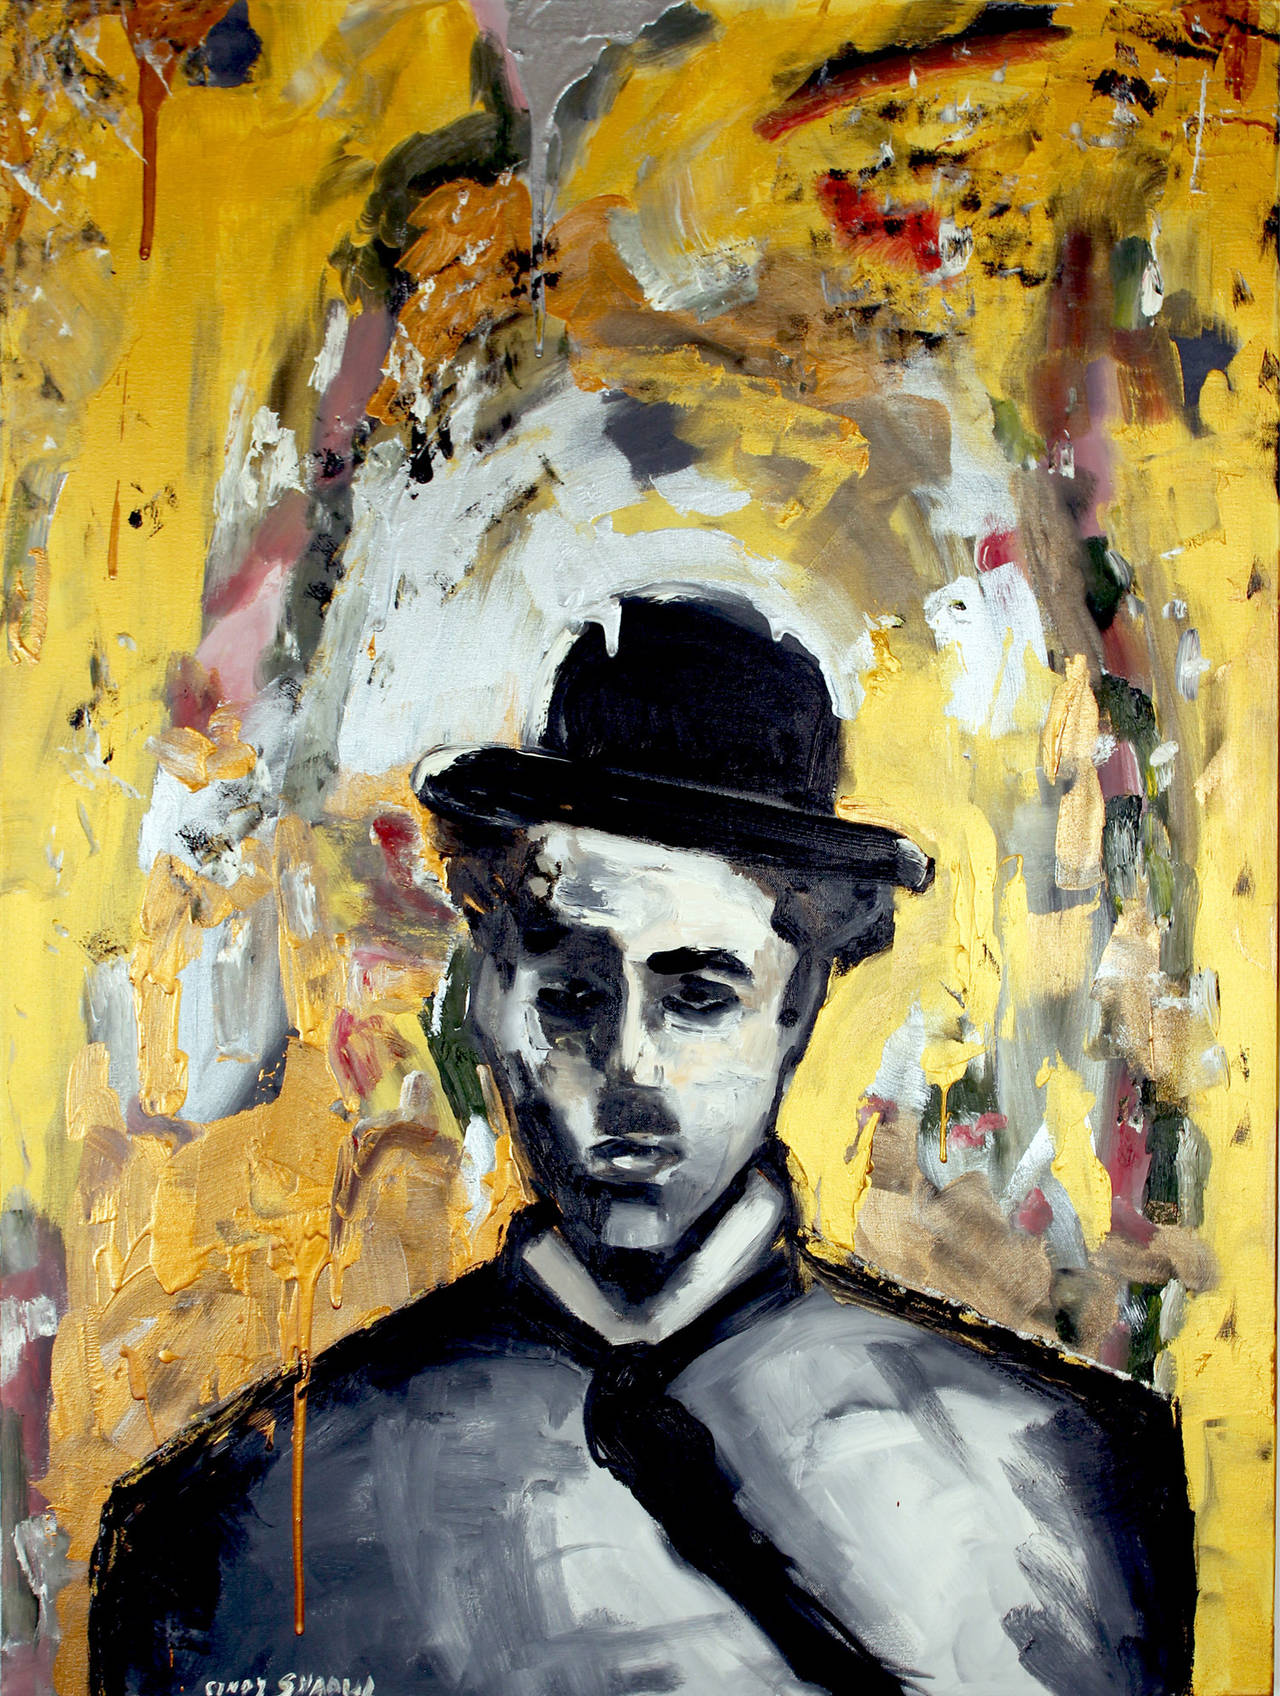 Cindy Shaoul Abstract Painting - Sad Chaplin